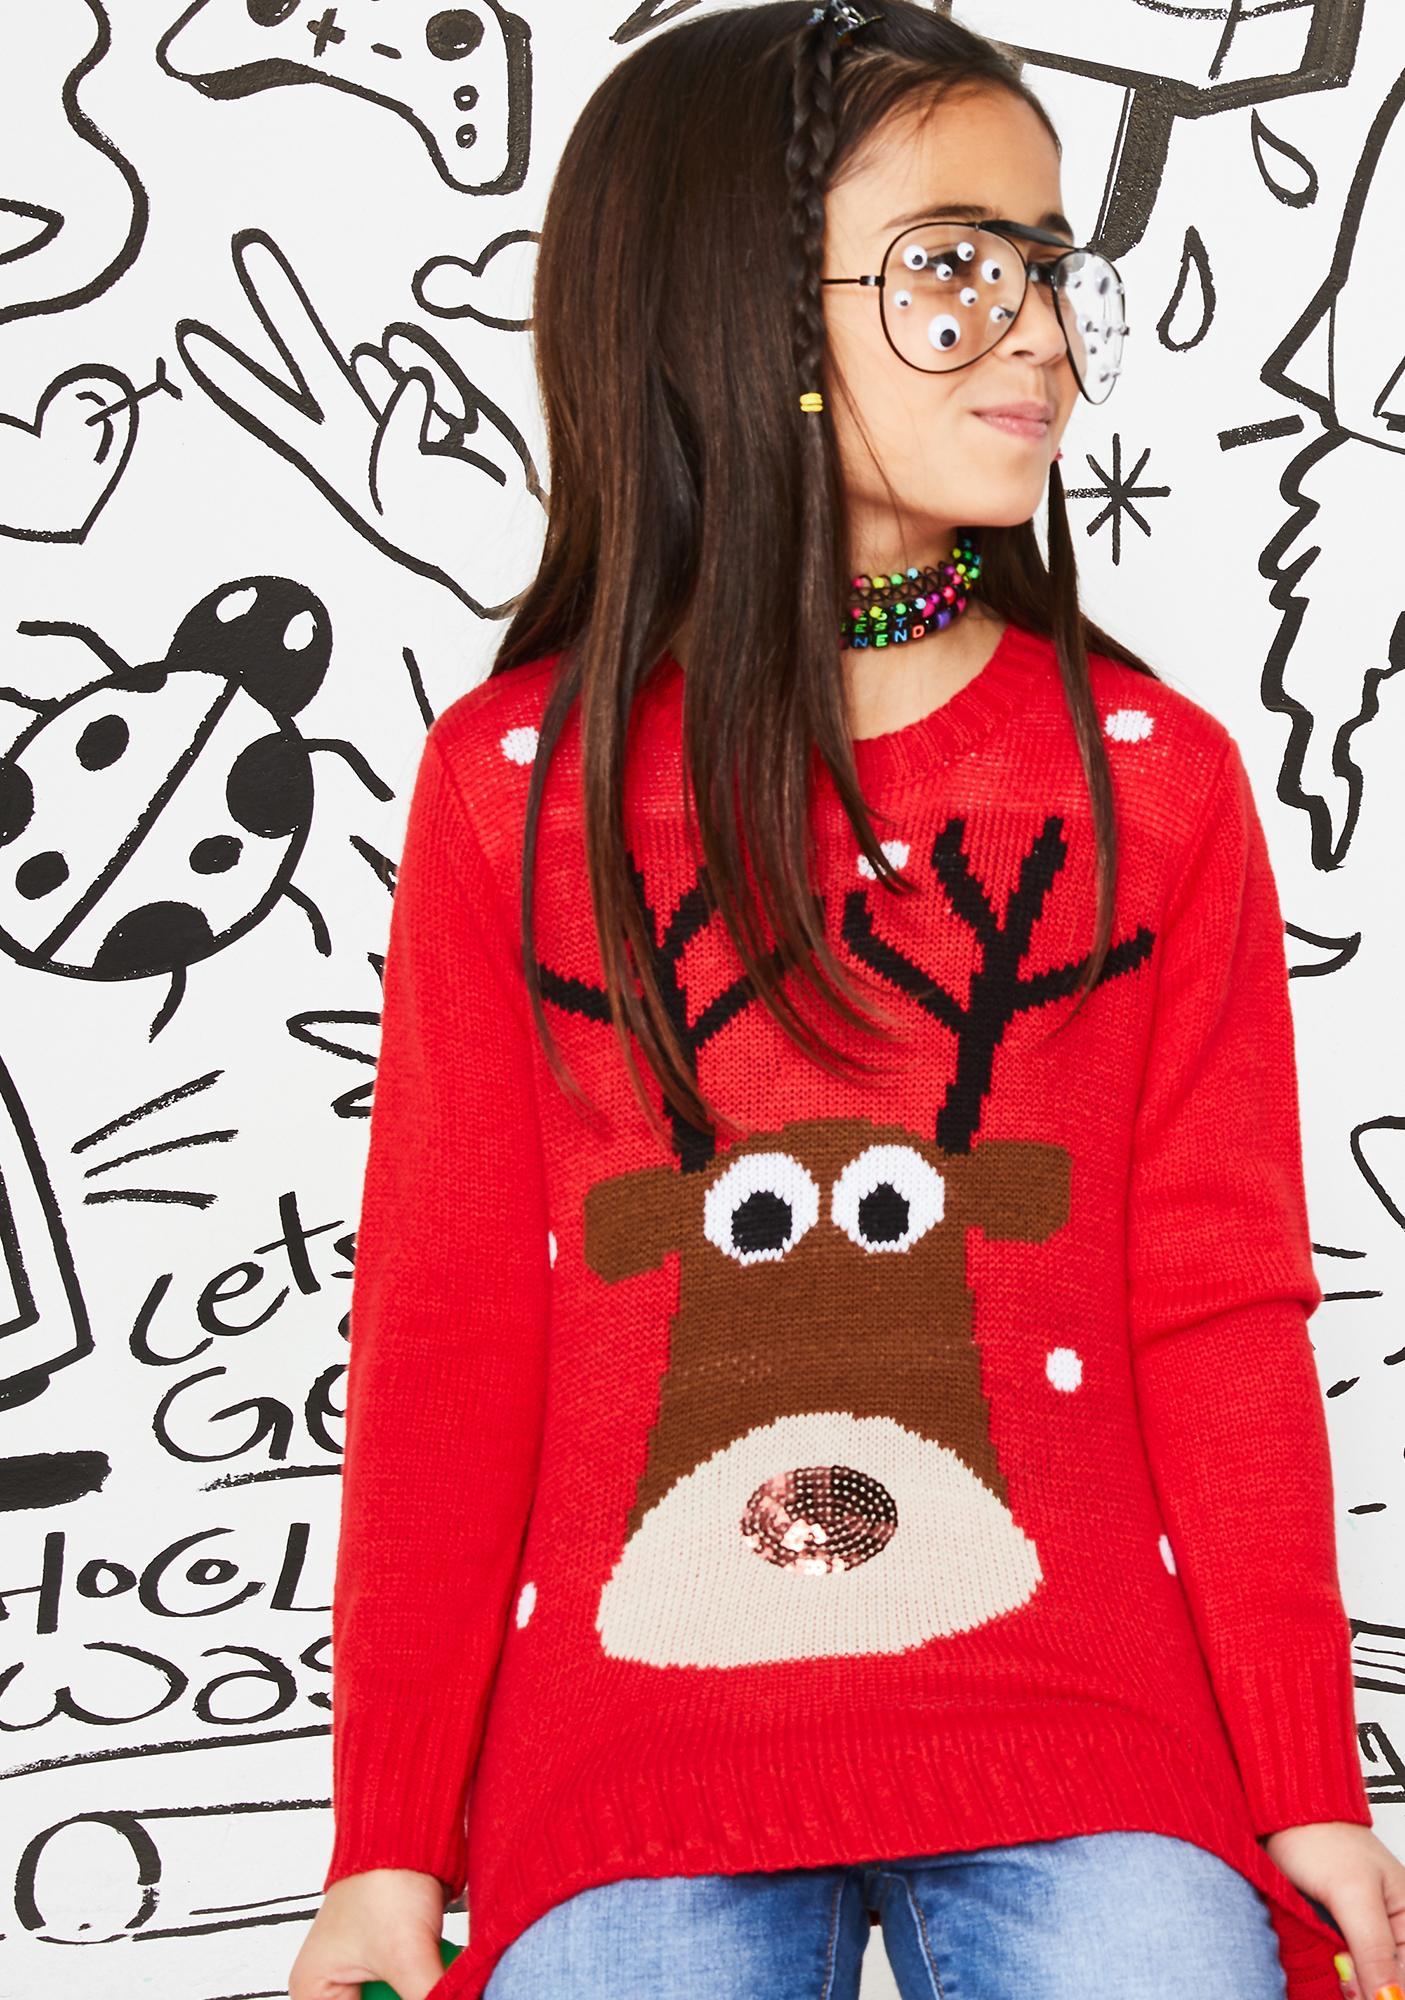 Kids Shiny Nose Reindeer Sweater